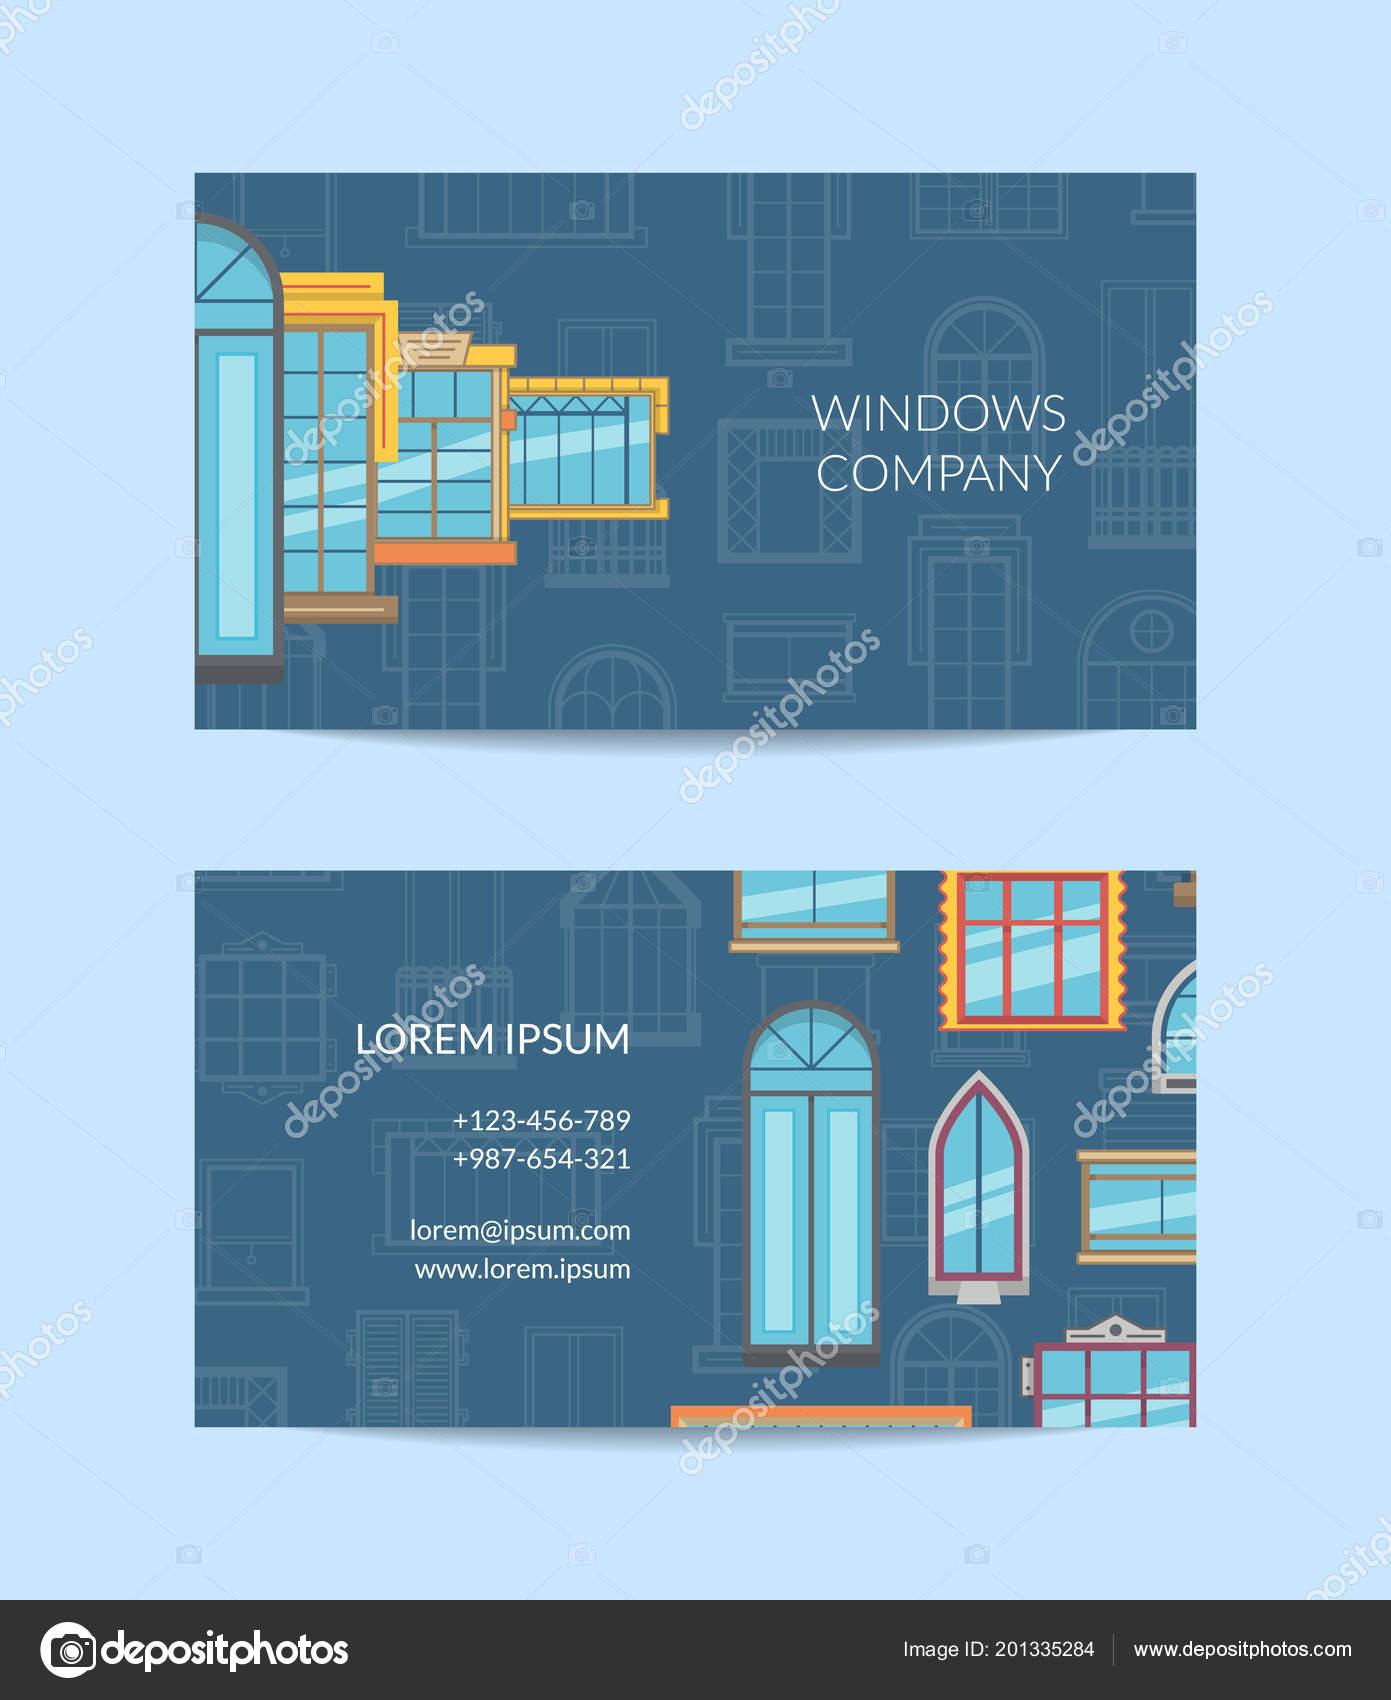 Vector window flat icons business card vetor de stock onyxprj vector window flat icons business card vetor de stock reheart Gallery